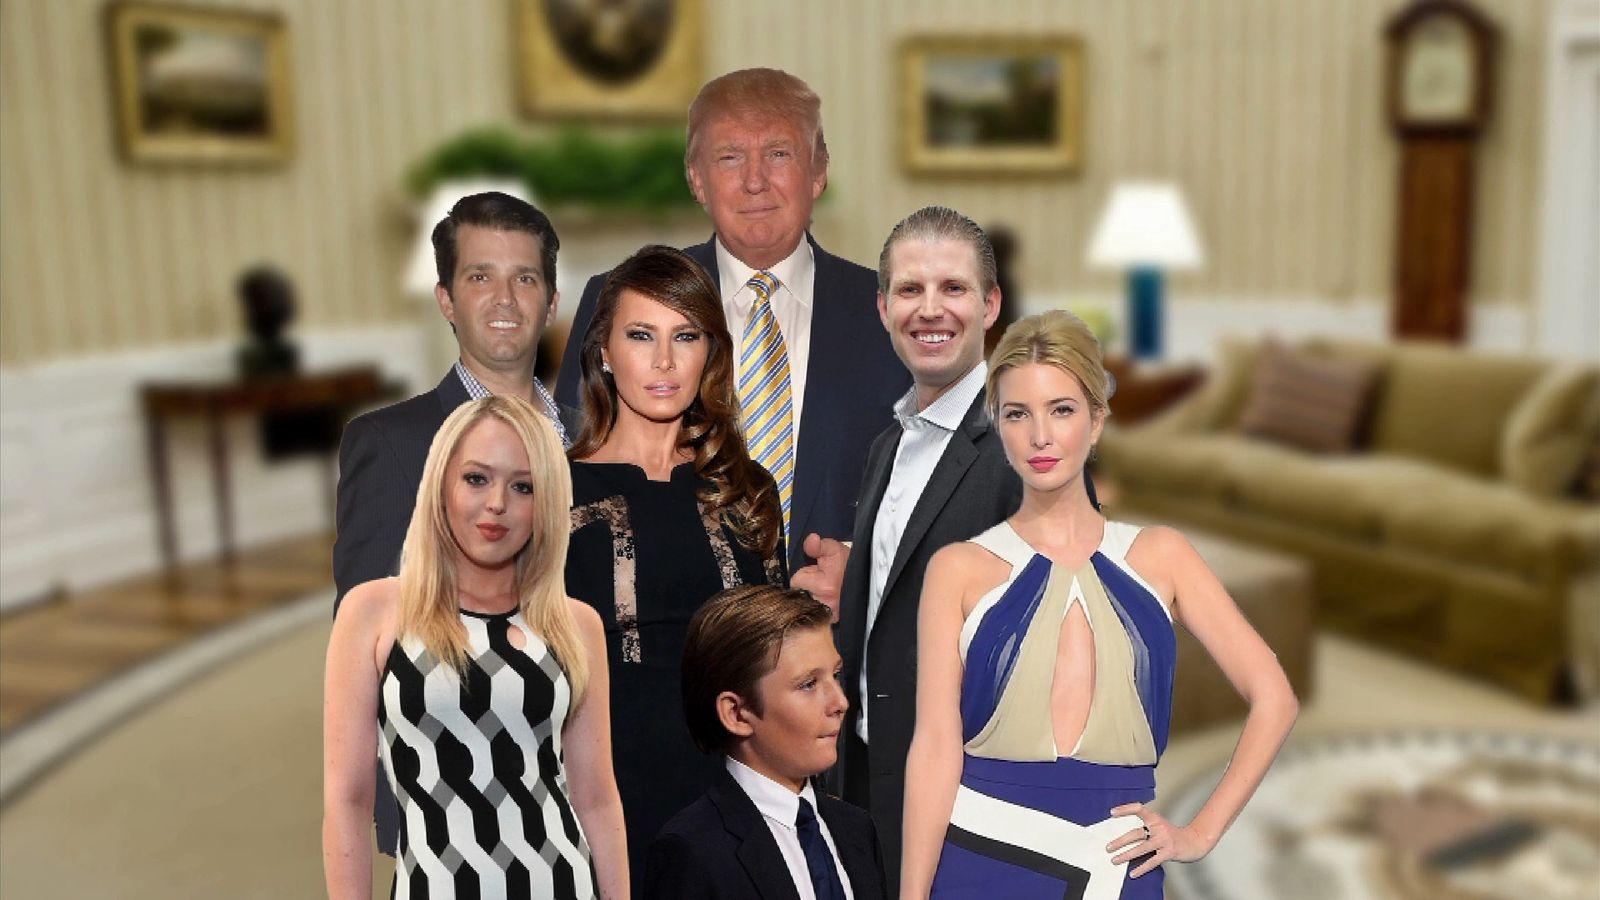 Home Alone Donald Trump The Origins Of Donald Trumps Hair - Achona Donald Trumps -5540